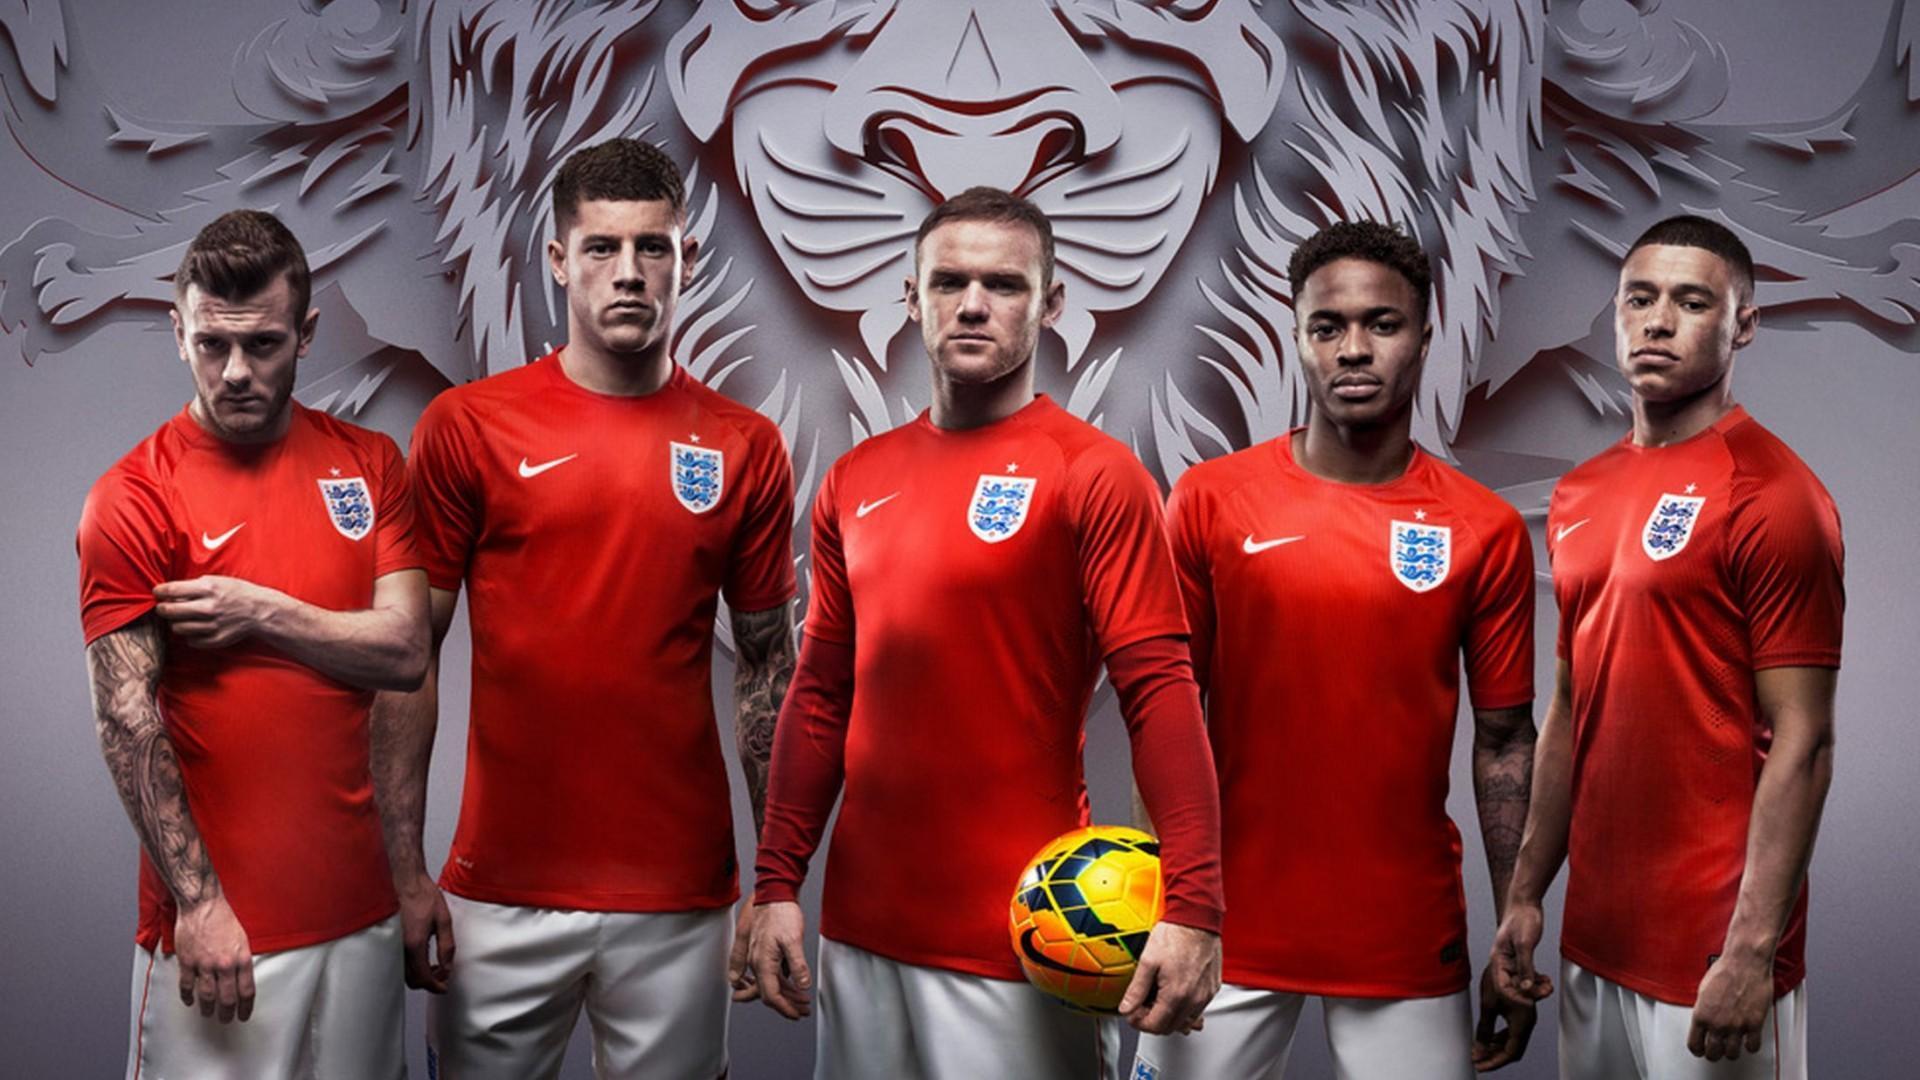 Inglaterra Equipo De Fútbol 2014 Copa Del Mundo - England Fifa World Cup 2018 , HD Wallpaper & Backgrounds